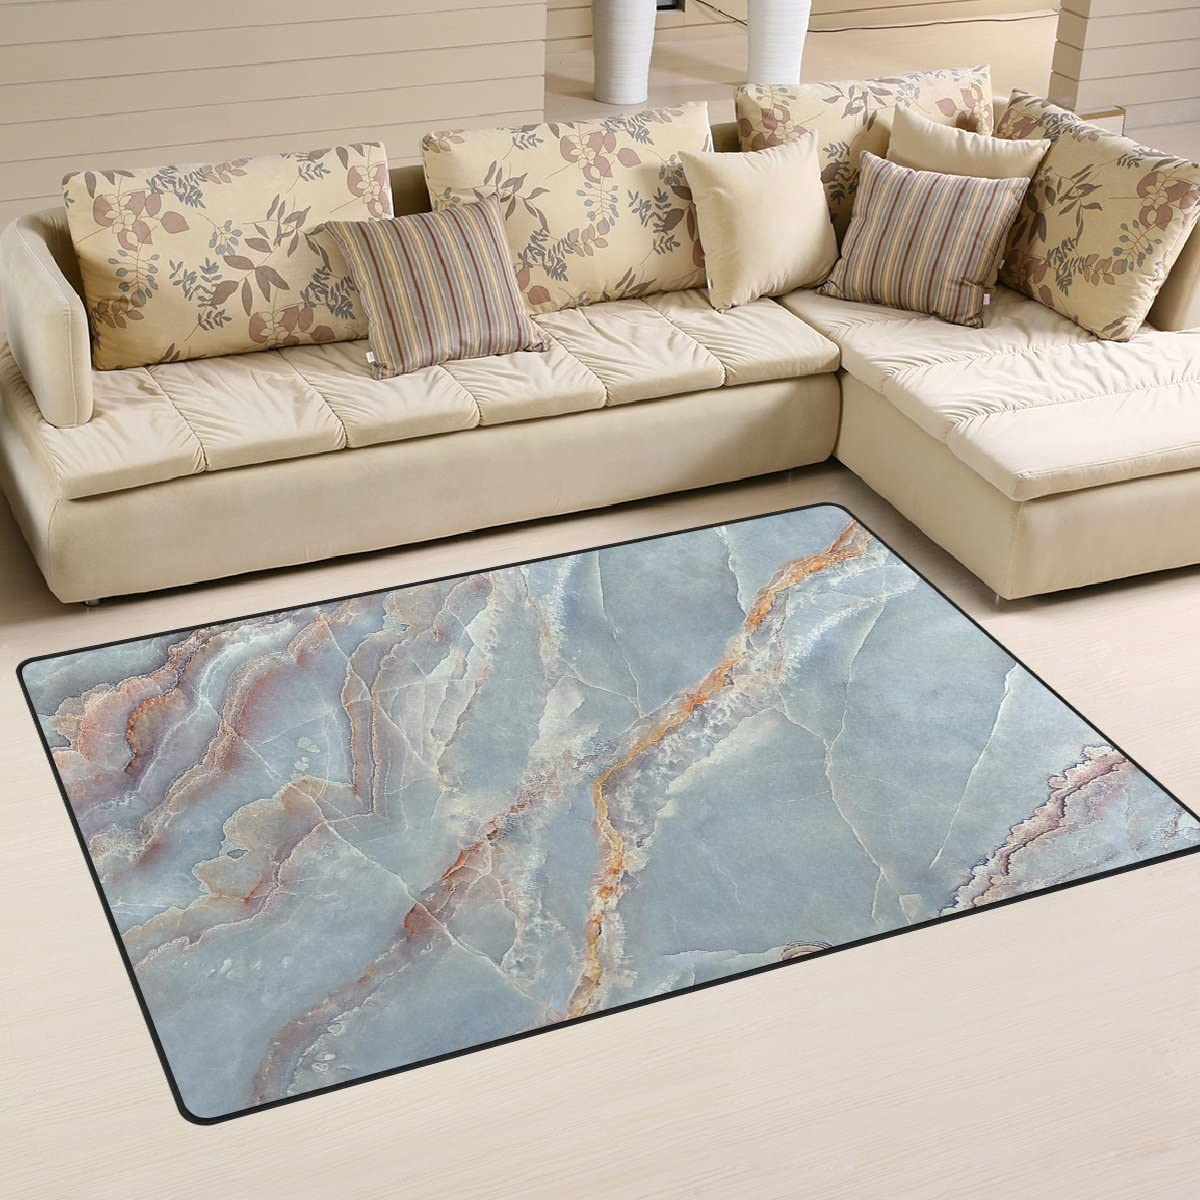 WellLee Area Rug 5'x3',Colorful Marble Blue Milk Floor Rug Non-Slip Doormat for Living Dining Dorm Room Bedroom Decor